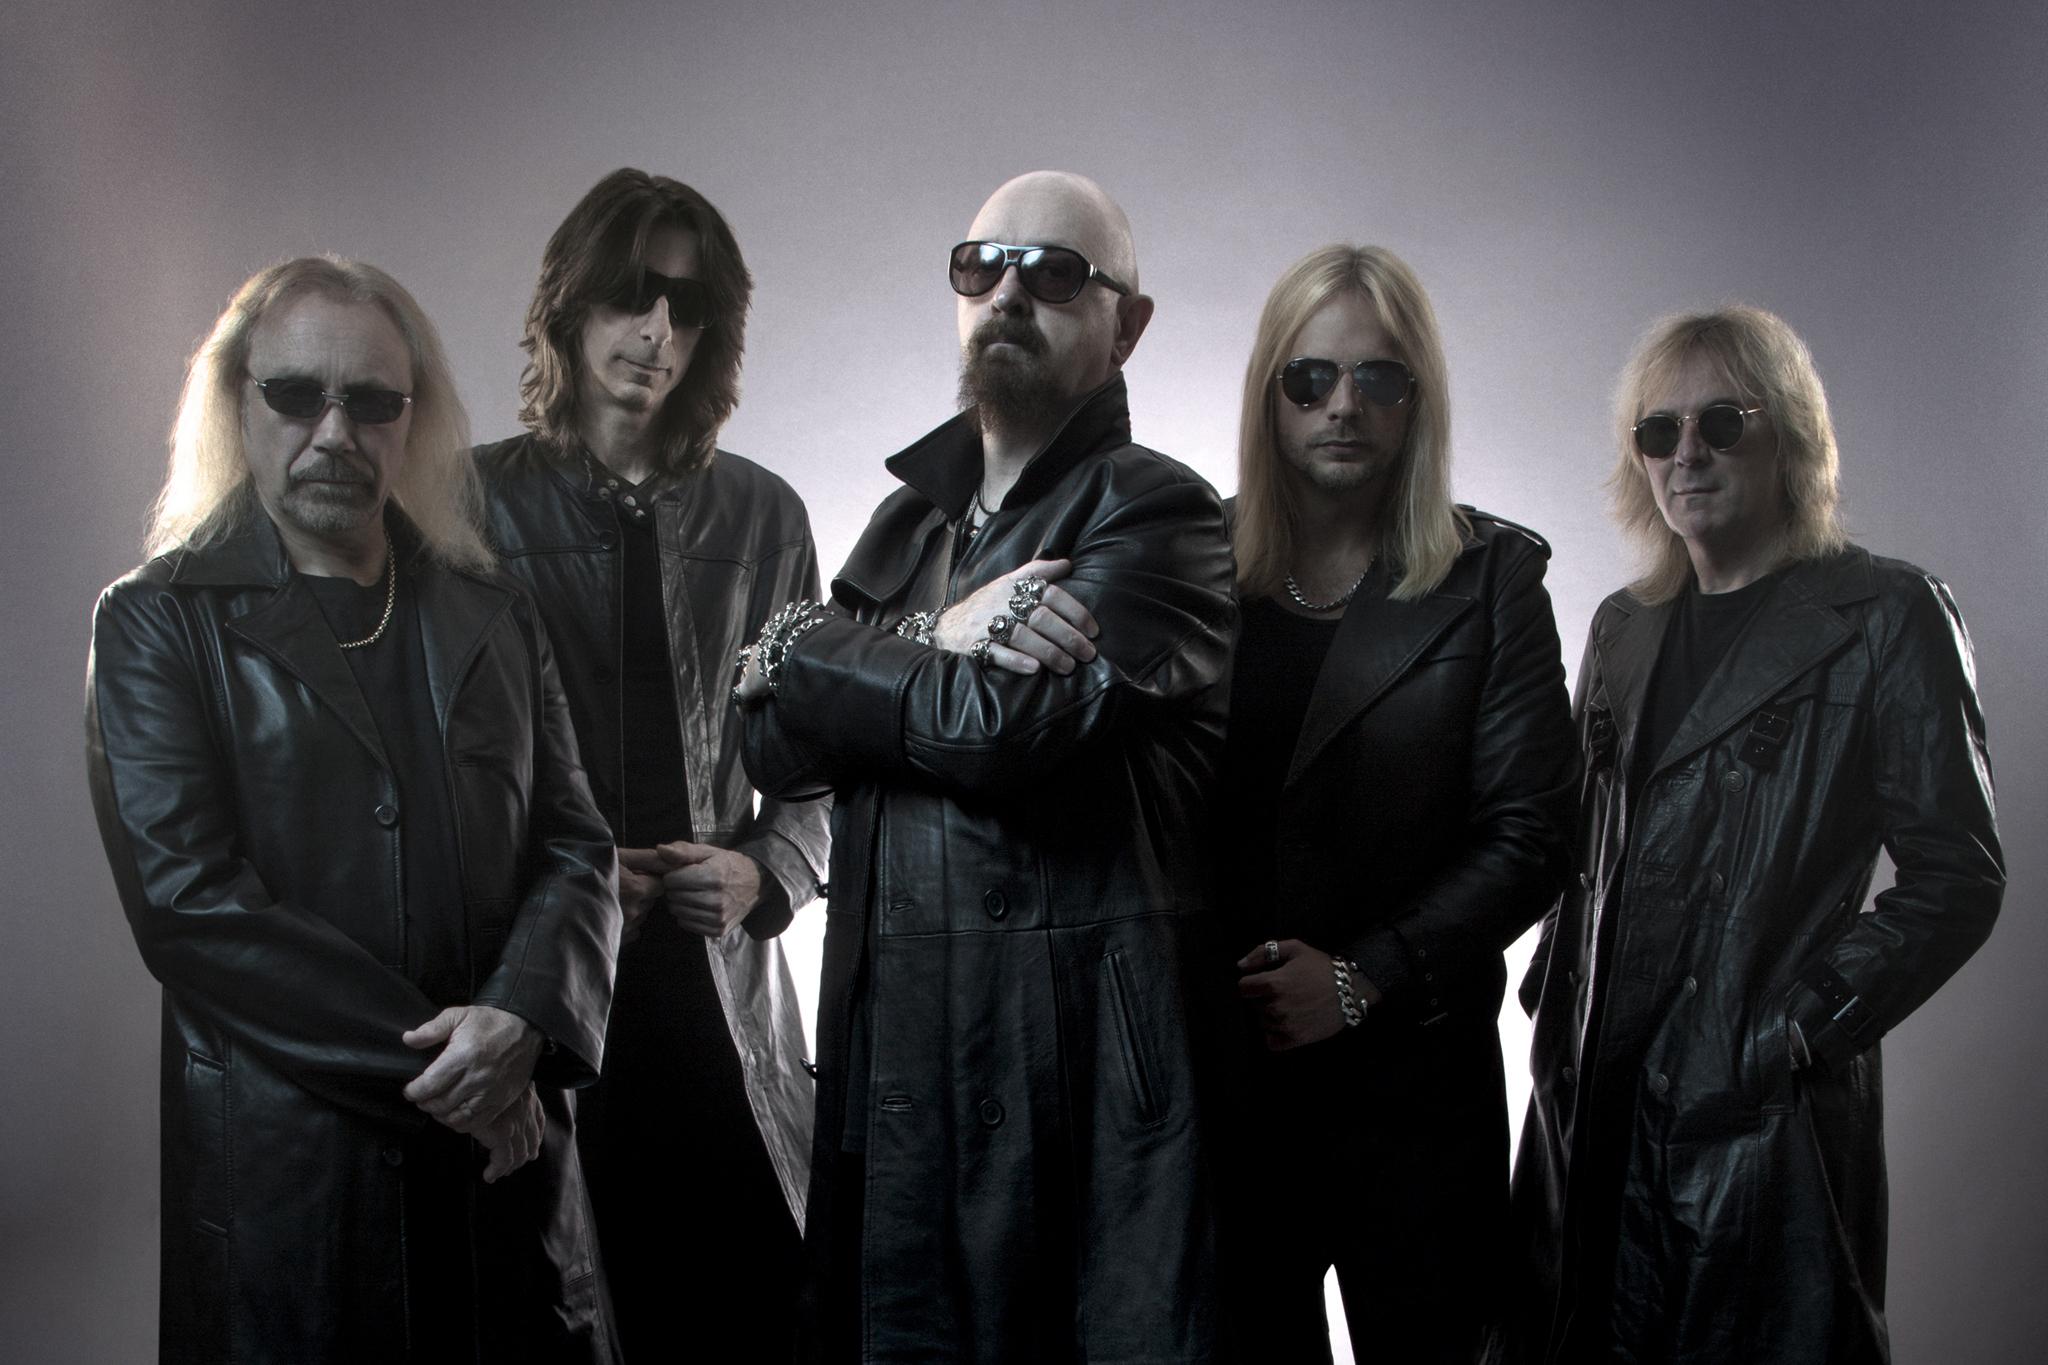 Judas Priest + Steel Panther | Barclays Center; Oct 9. Izod Center; Oct 17.